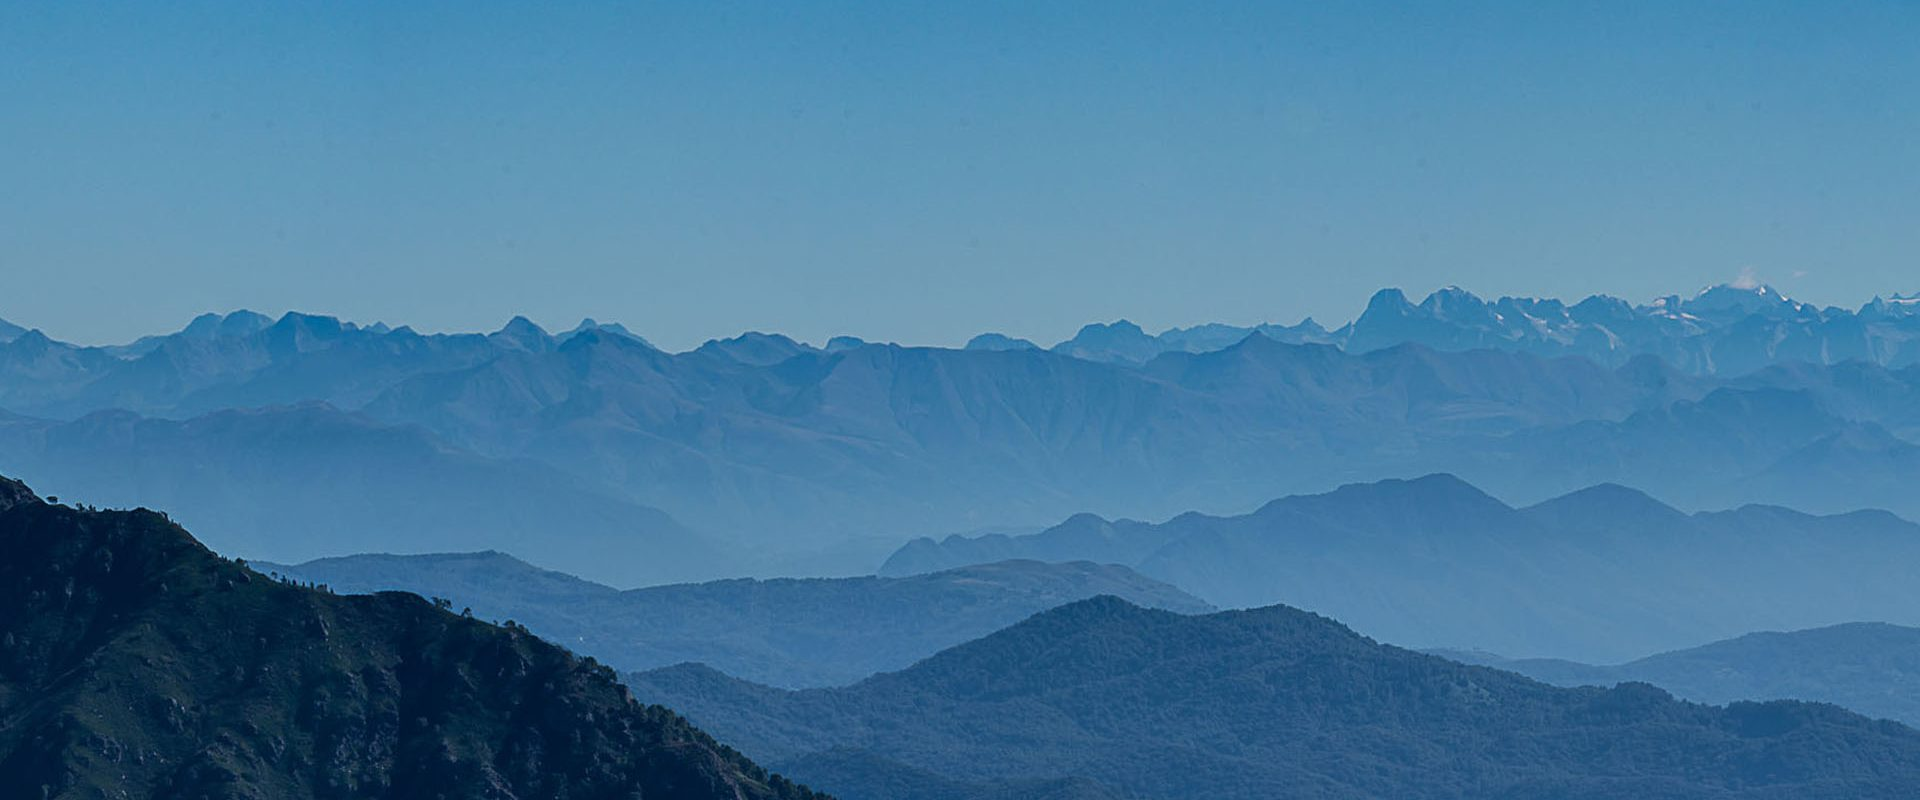 alpemoncerchio-panorama-montagne